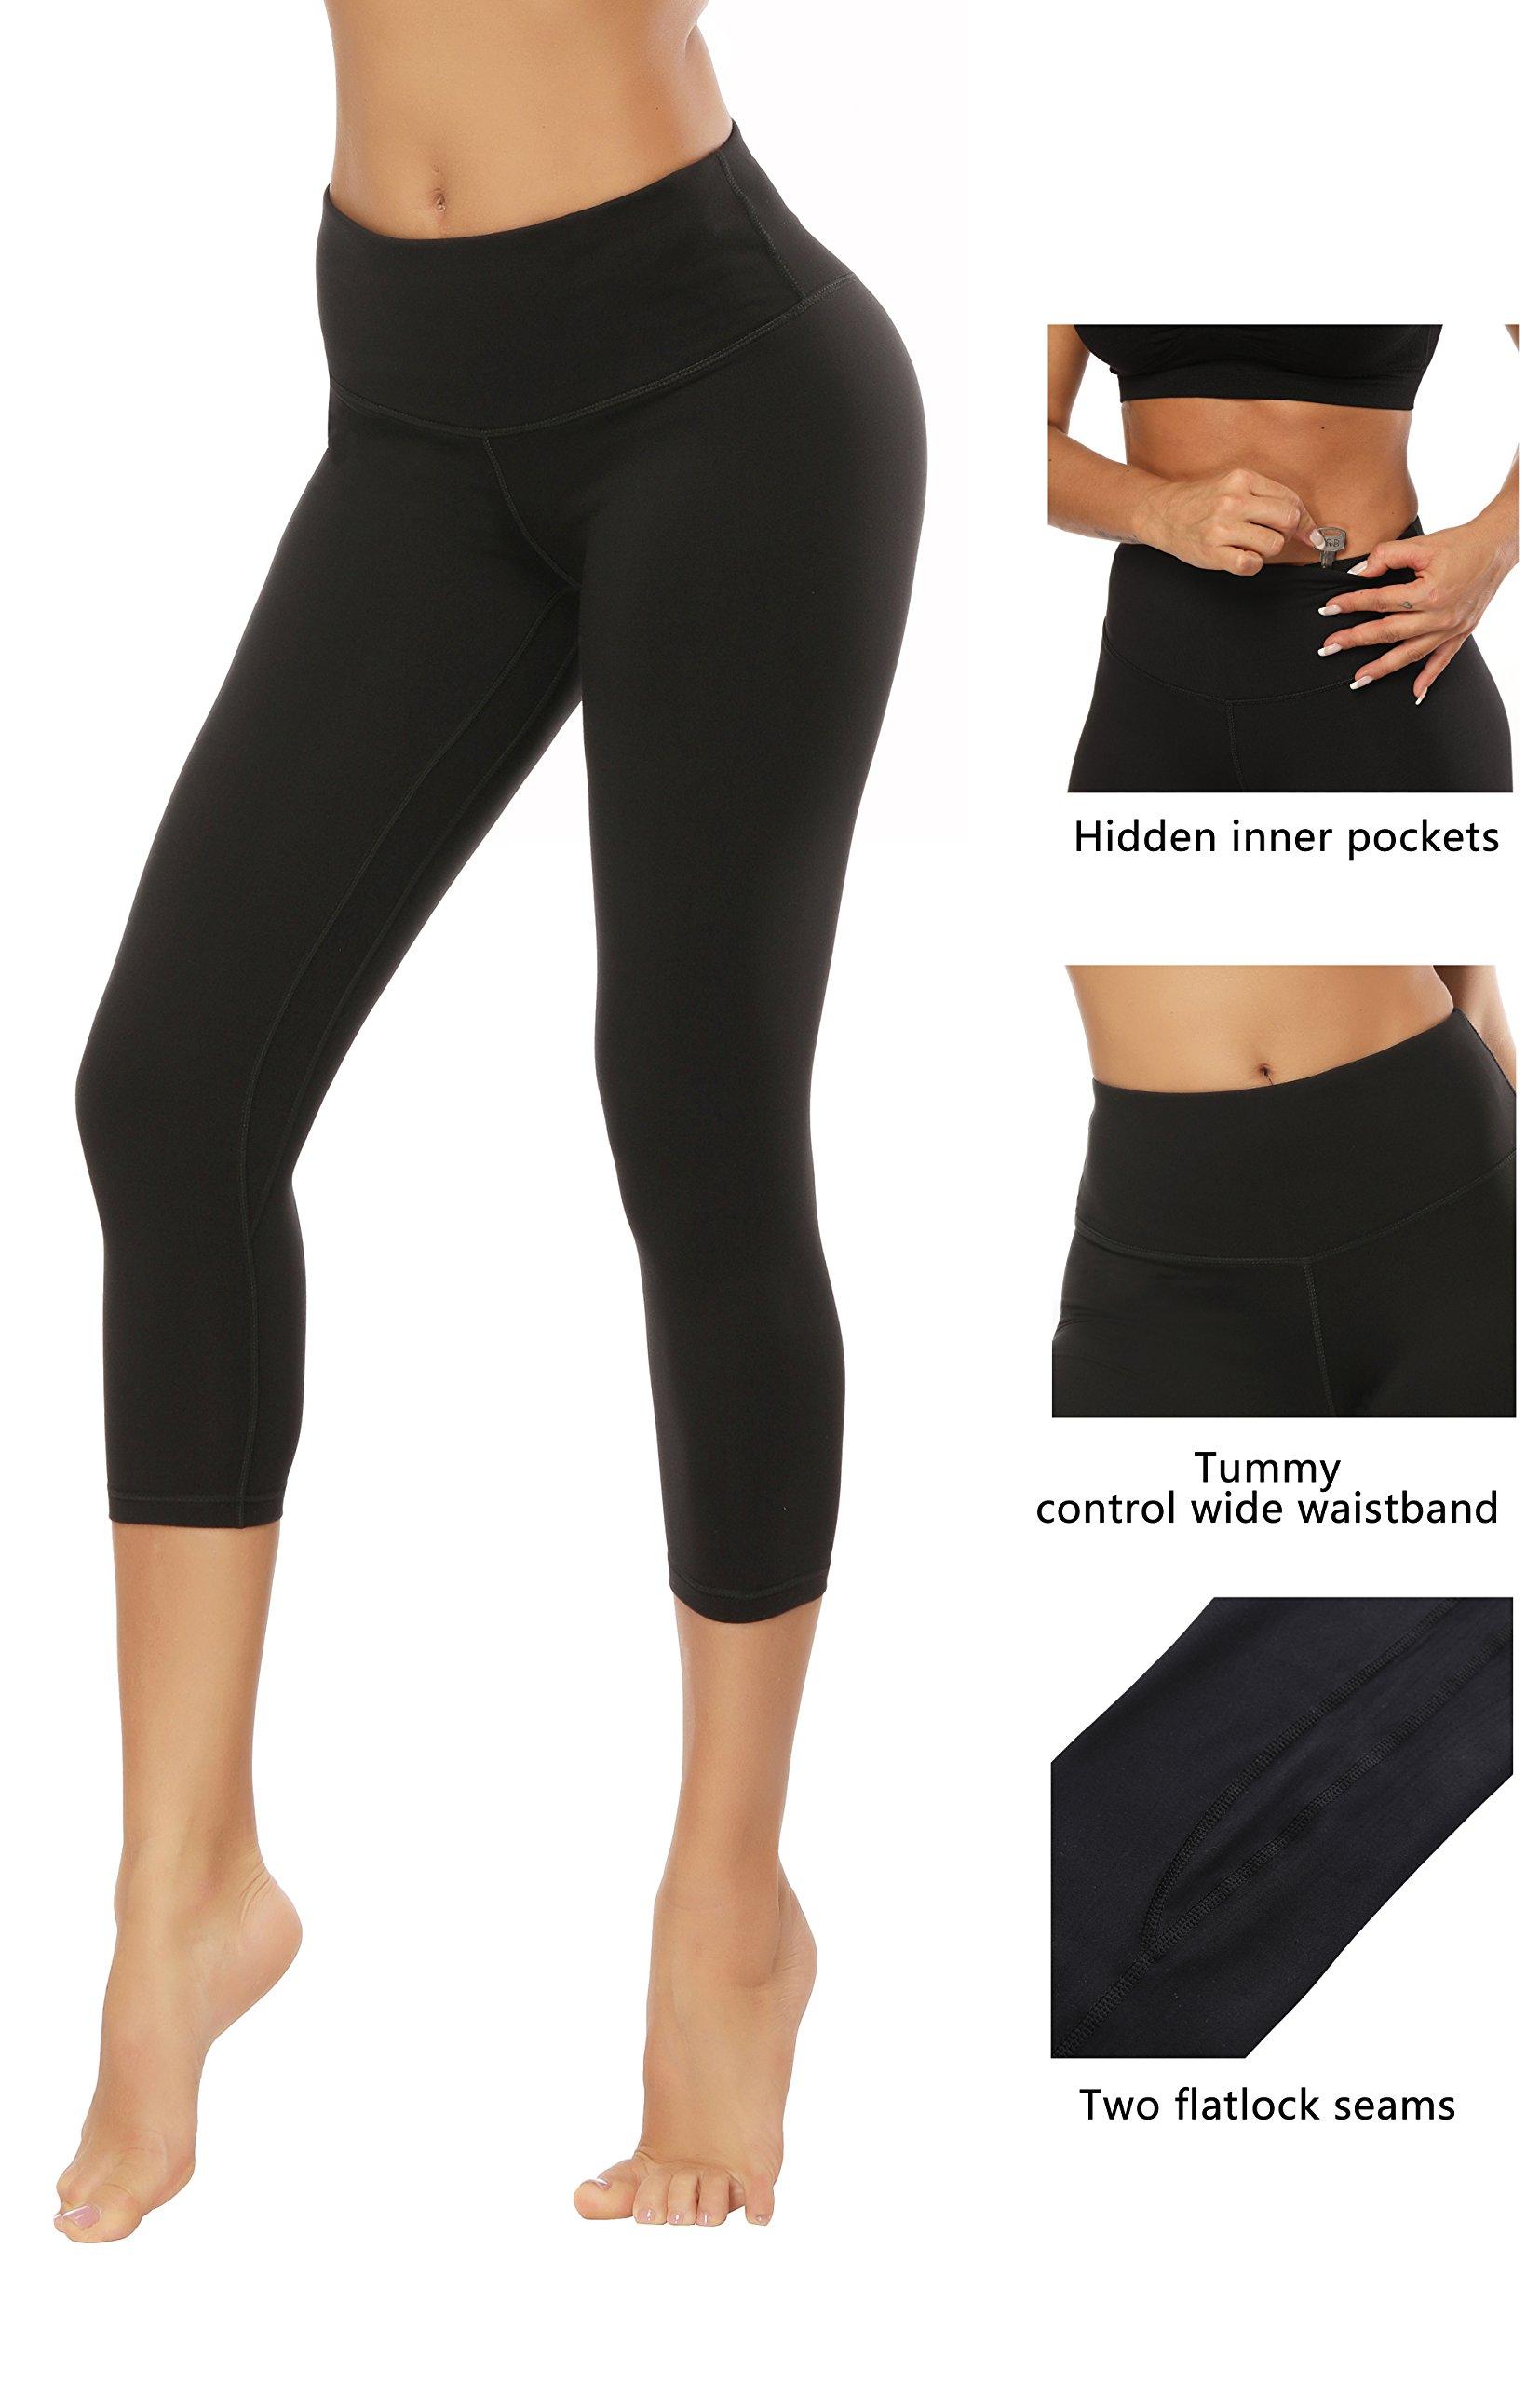 Fengbay Capris Leggings, Capris Yoga Pants Tummy Control Workout Running 4 Way Stretch High Waist Capris Workout Leggings by Fengbay (Image #2)